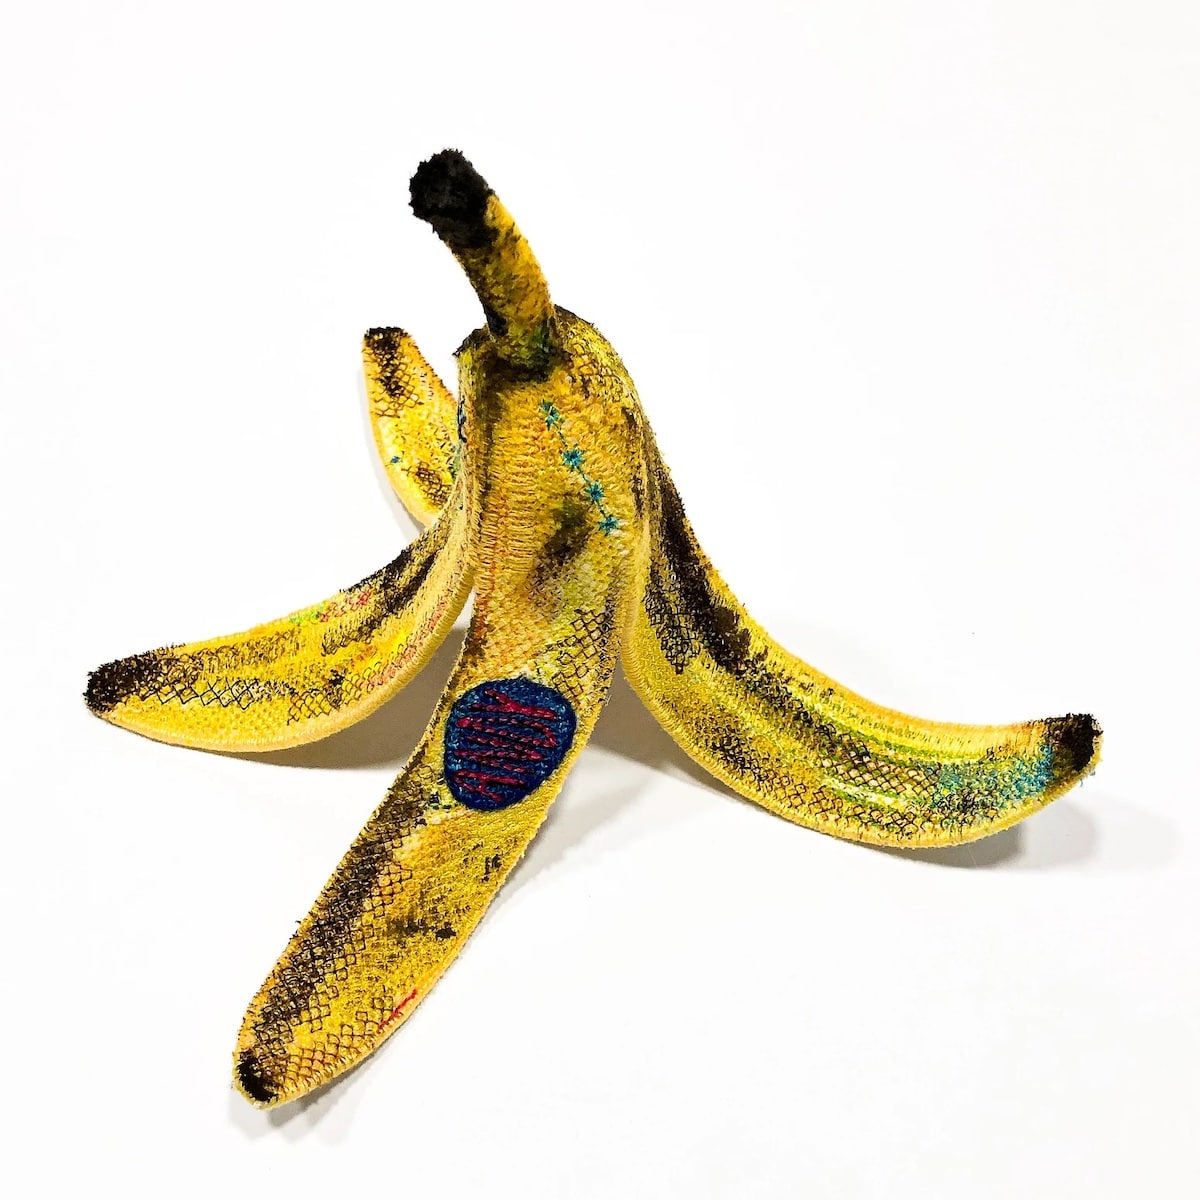 Felt and Embroidery Banana Peel